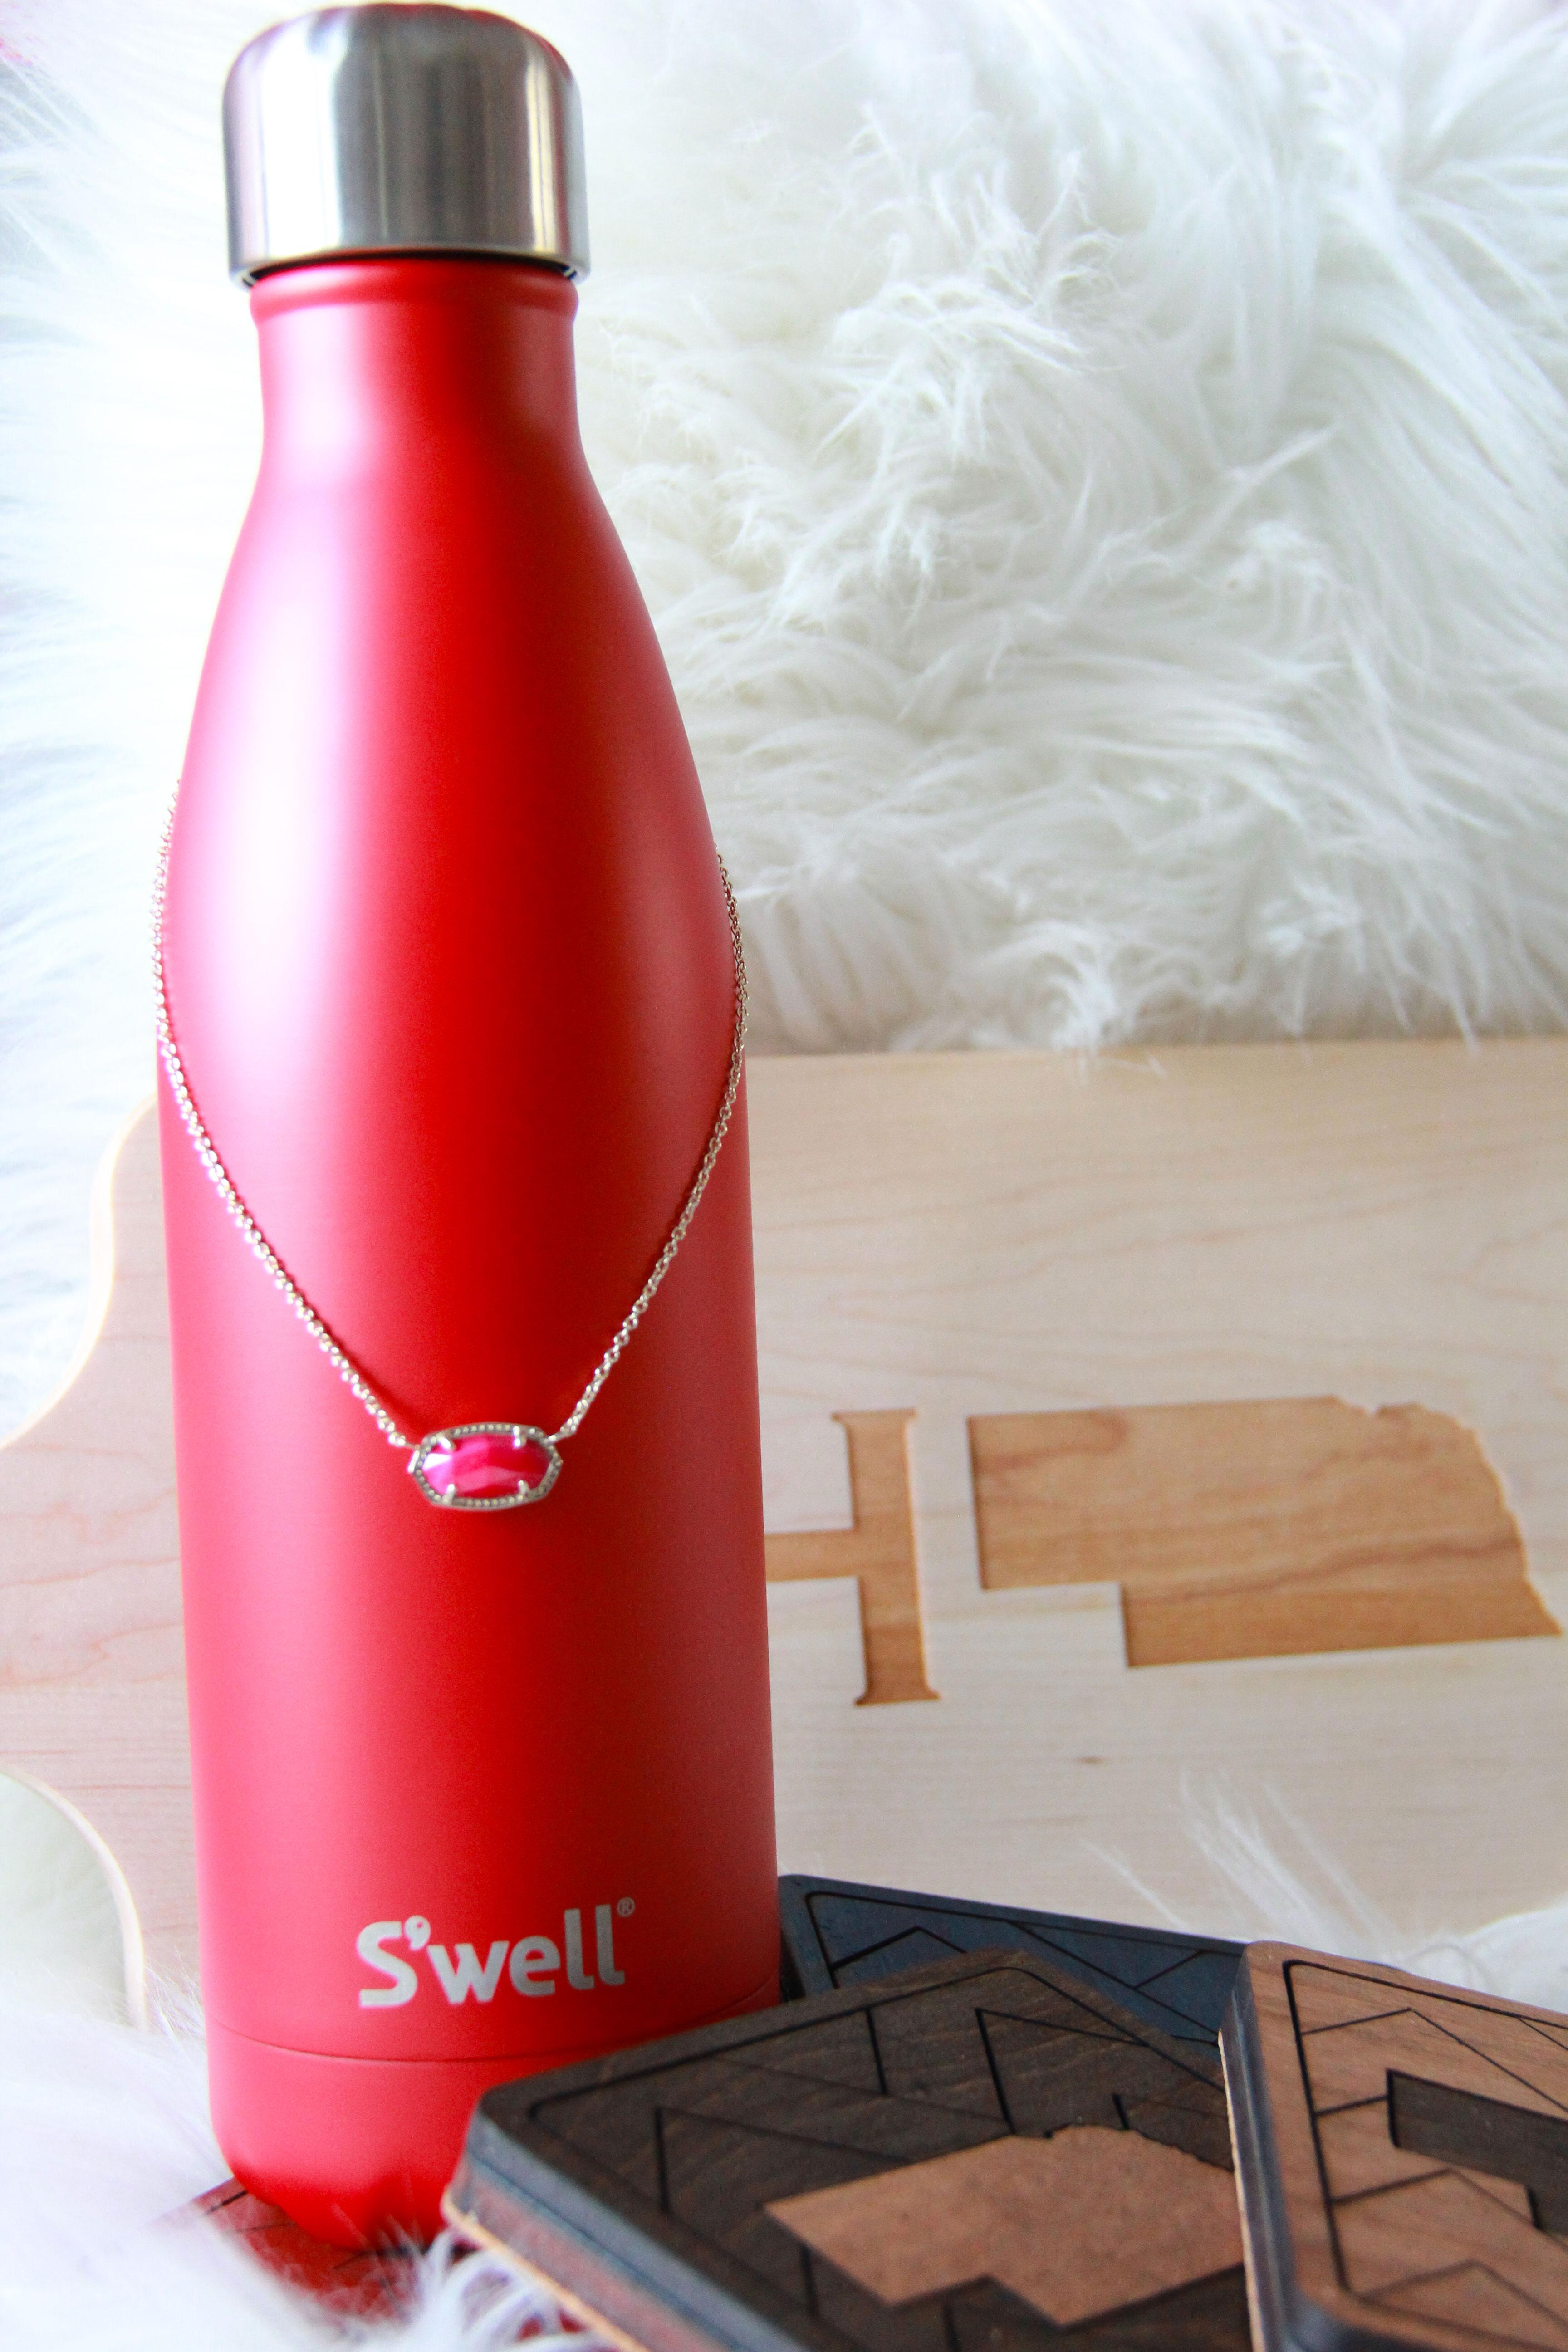 swell bottle, Nebraska coasters and Nebraska maple leaf board